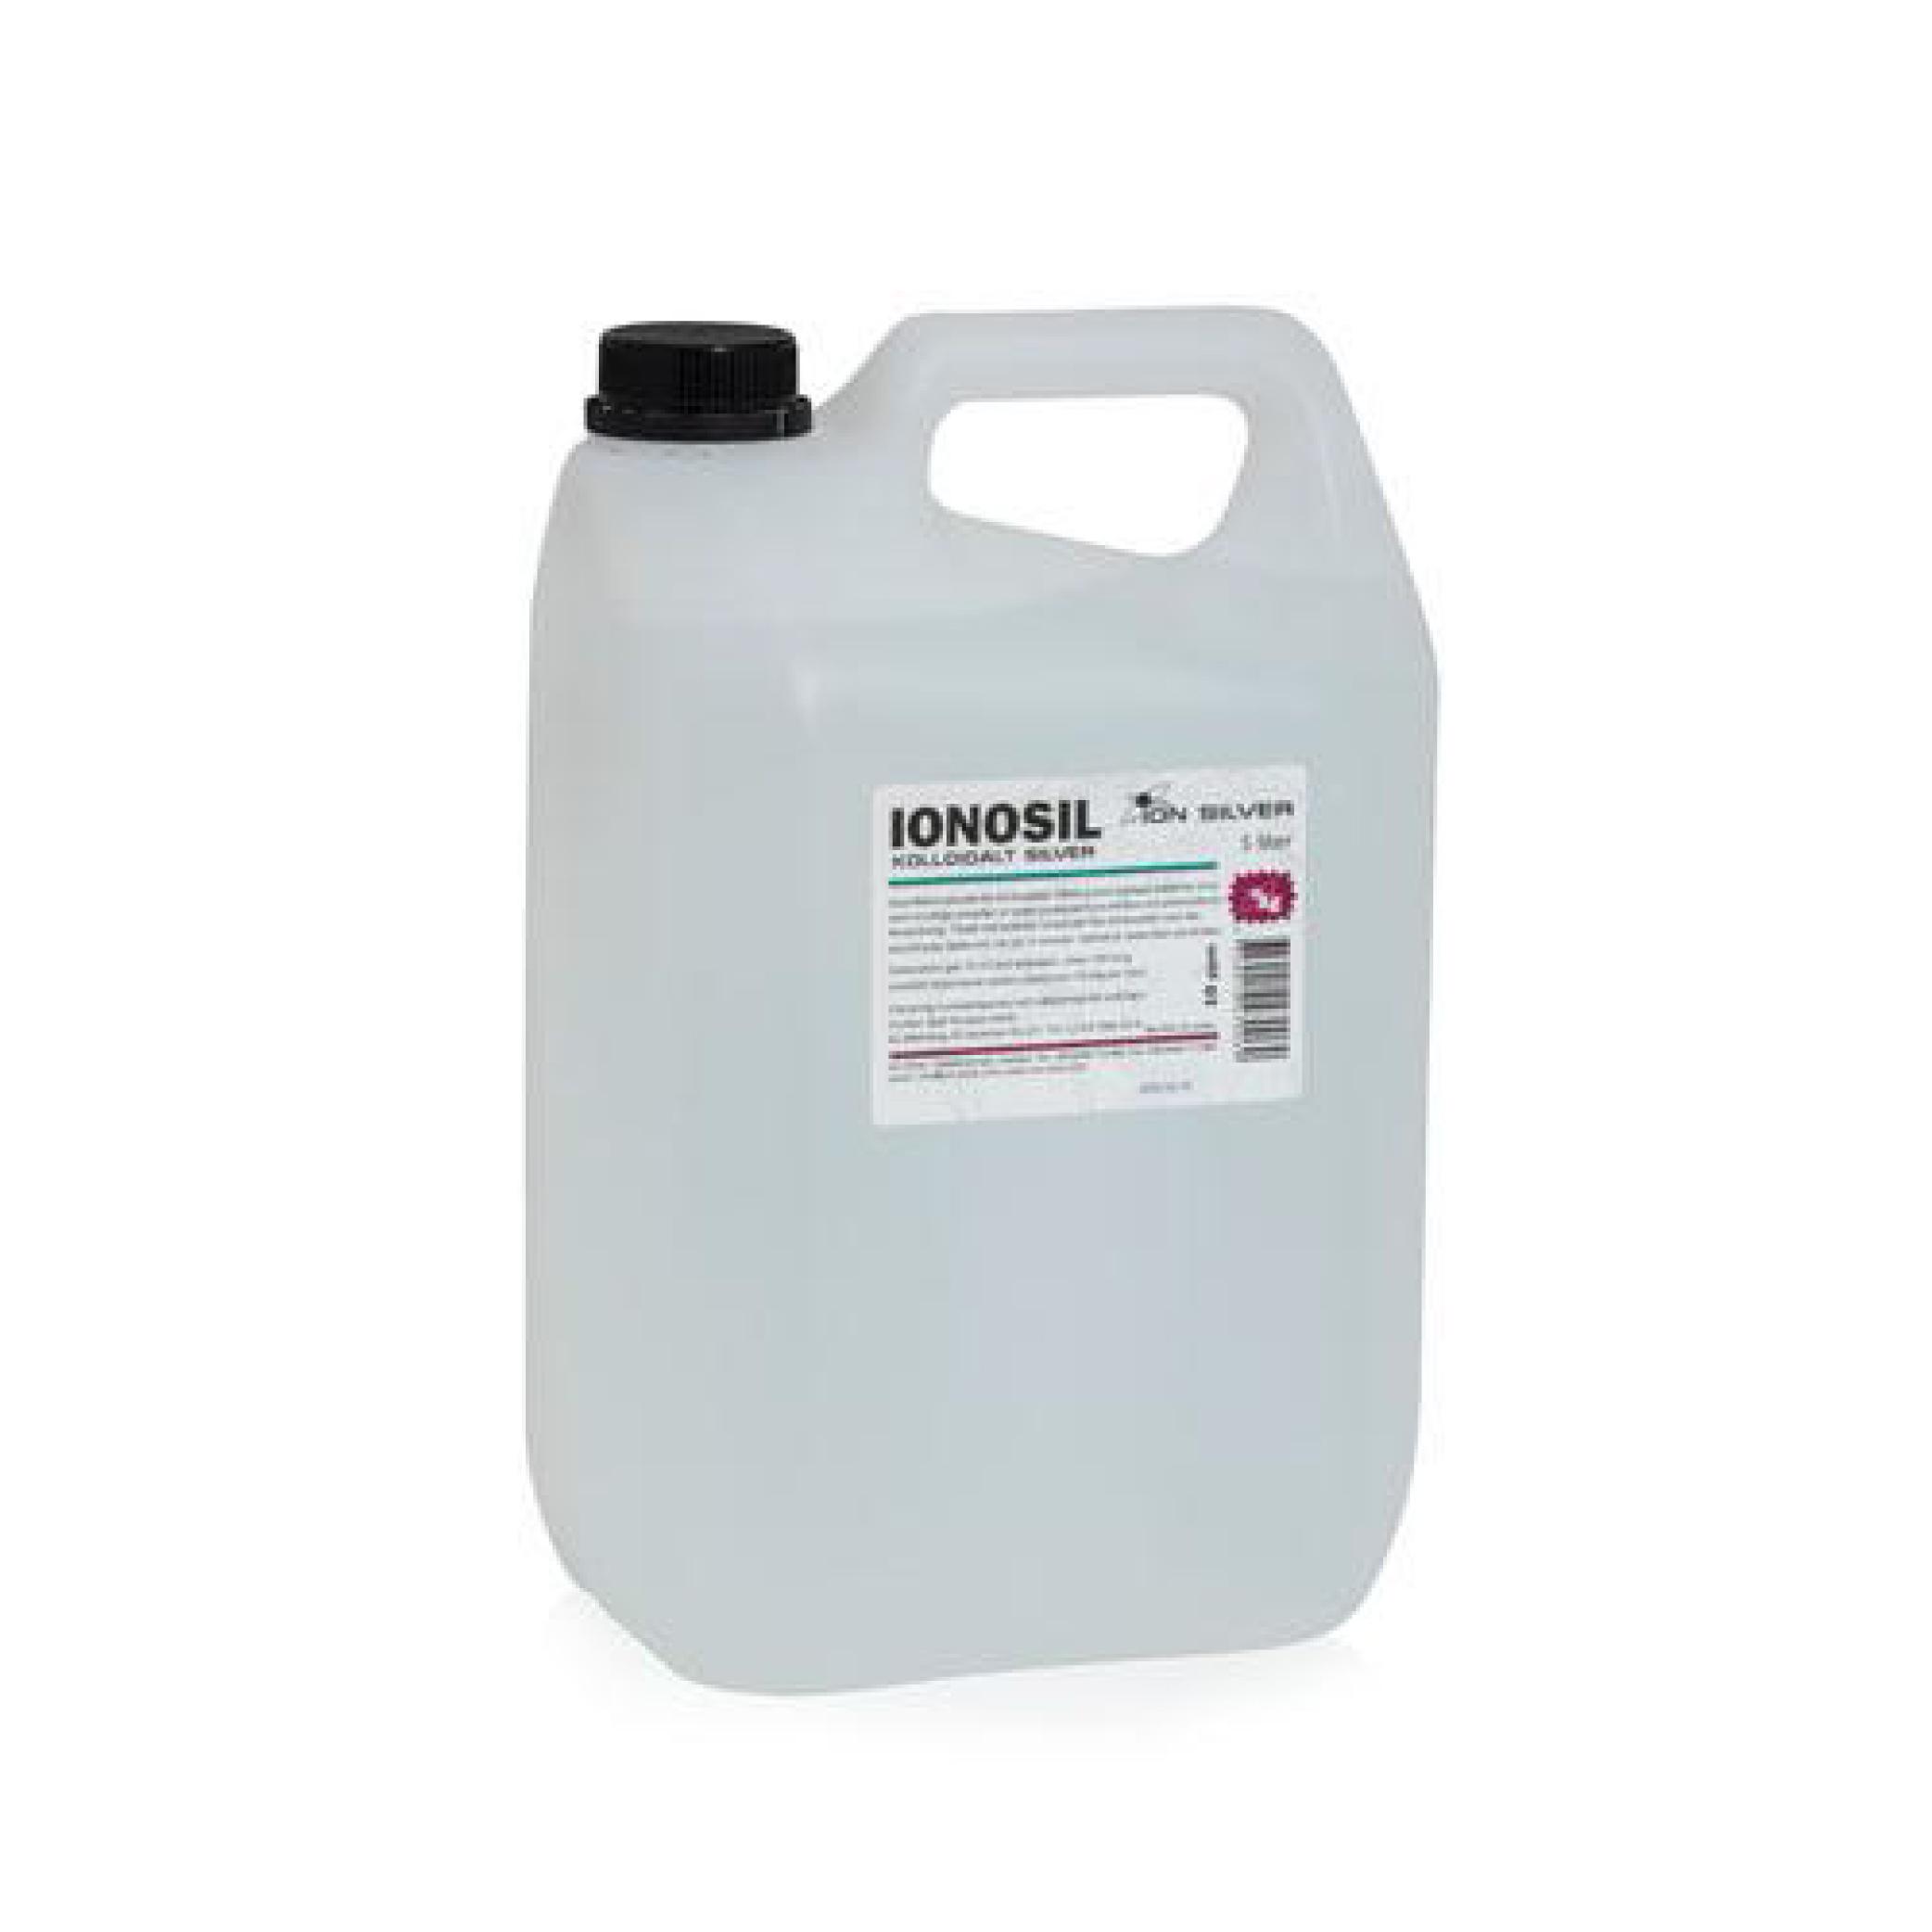 Ionosil 5 L